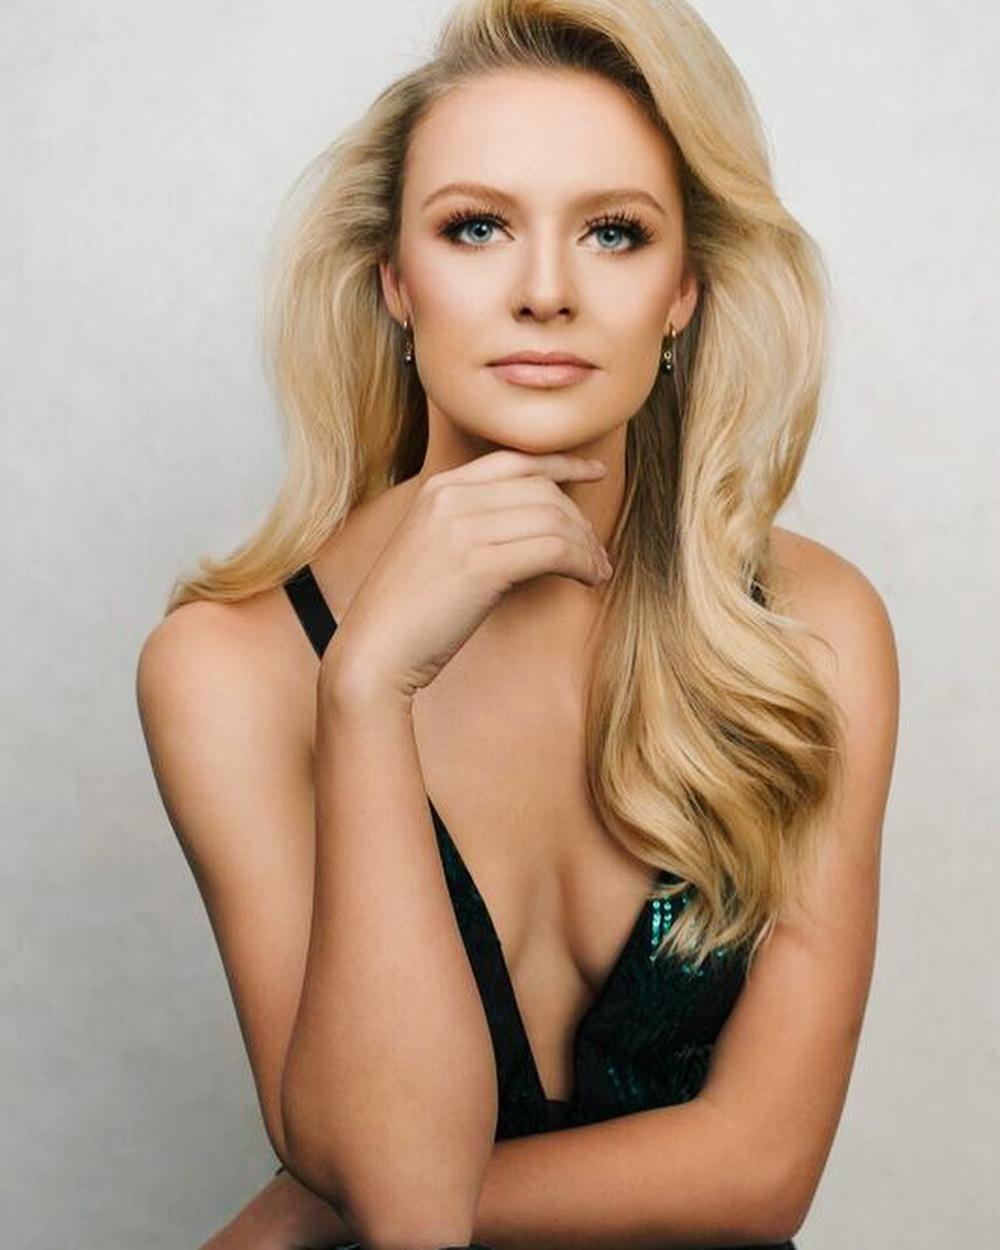 candidatas a miss world australia 2018. final: 31 agosto. - Página 17 8gy6jw8u